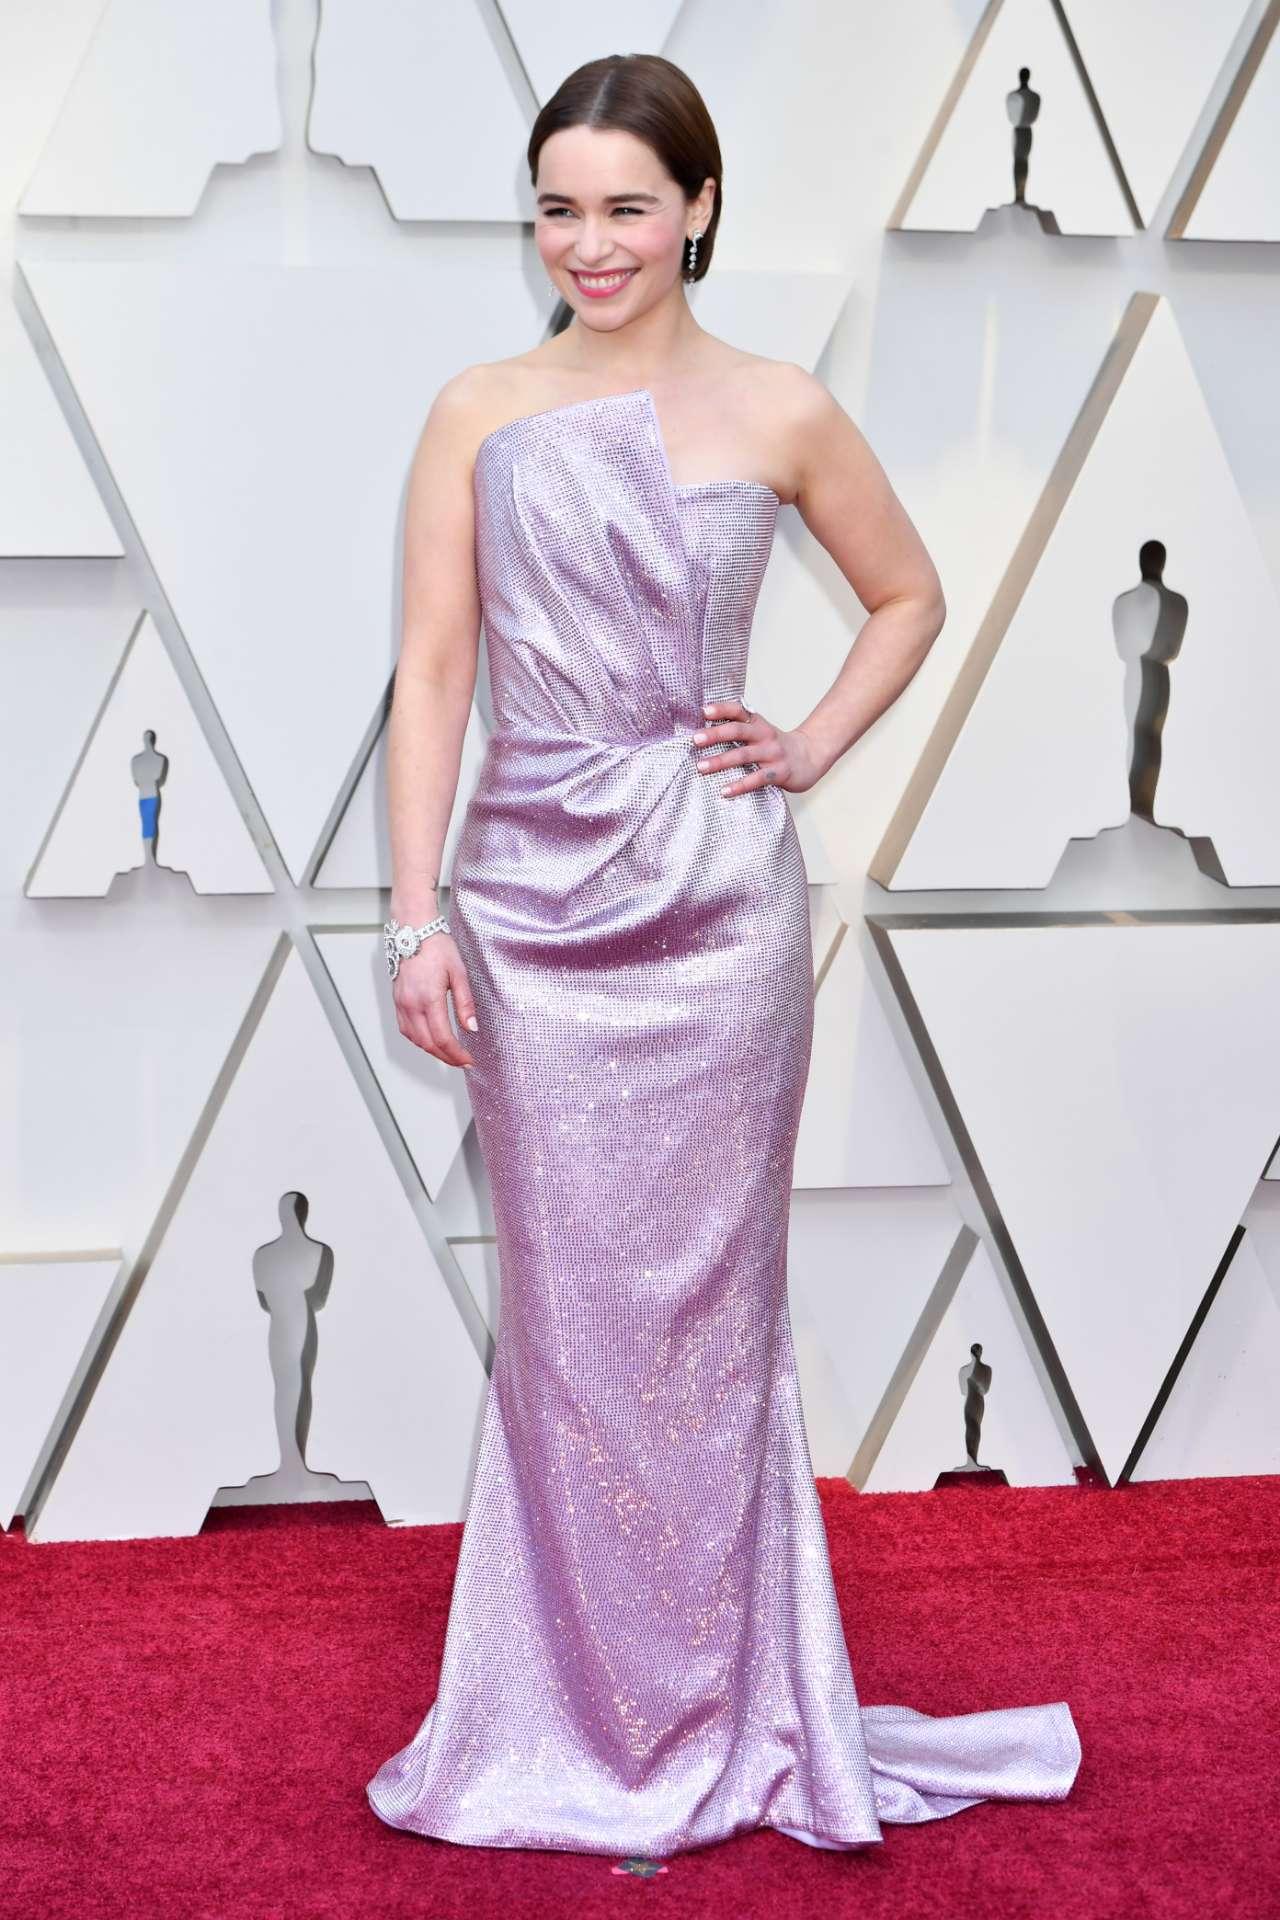 Oscars 2019 Game Of Thrones Star Emilia Clarke Stuns On